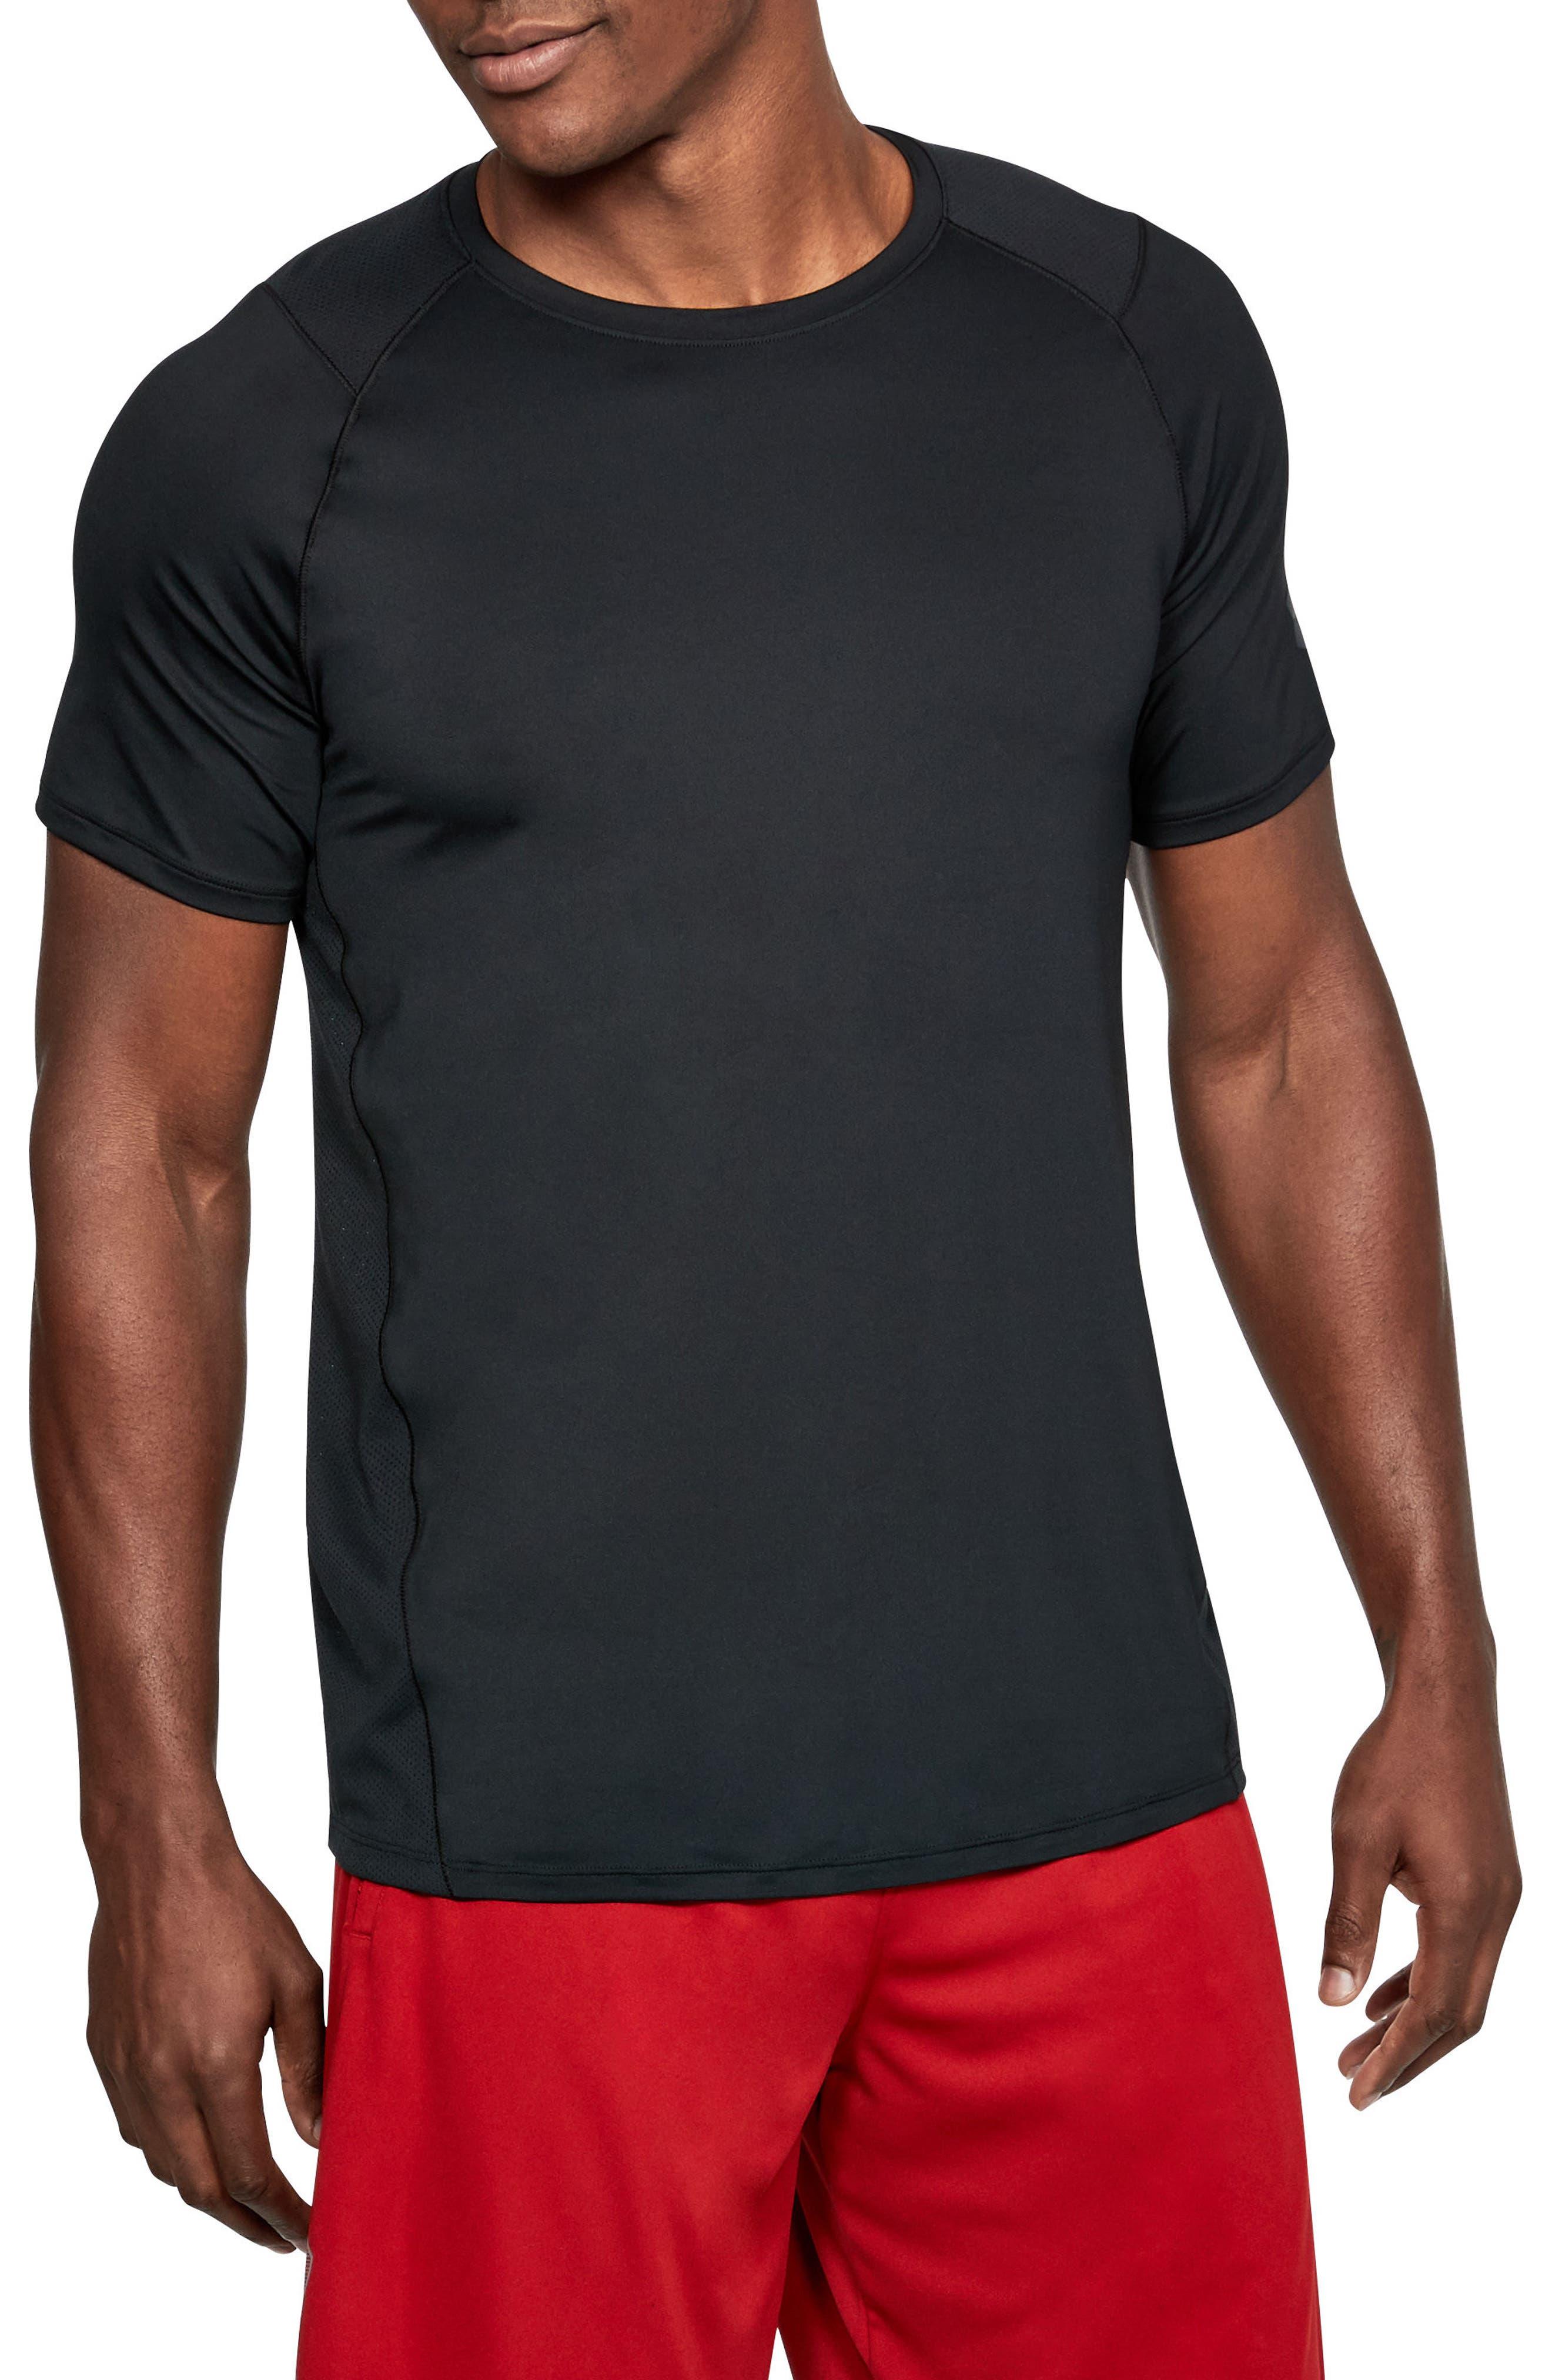 Raid 2.0 Crewneck T-Shirt,                             Main thumbnail 1, color,                             Black/ Stealth Gray